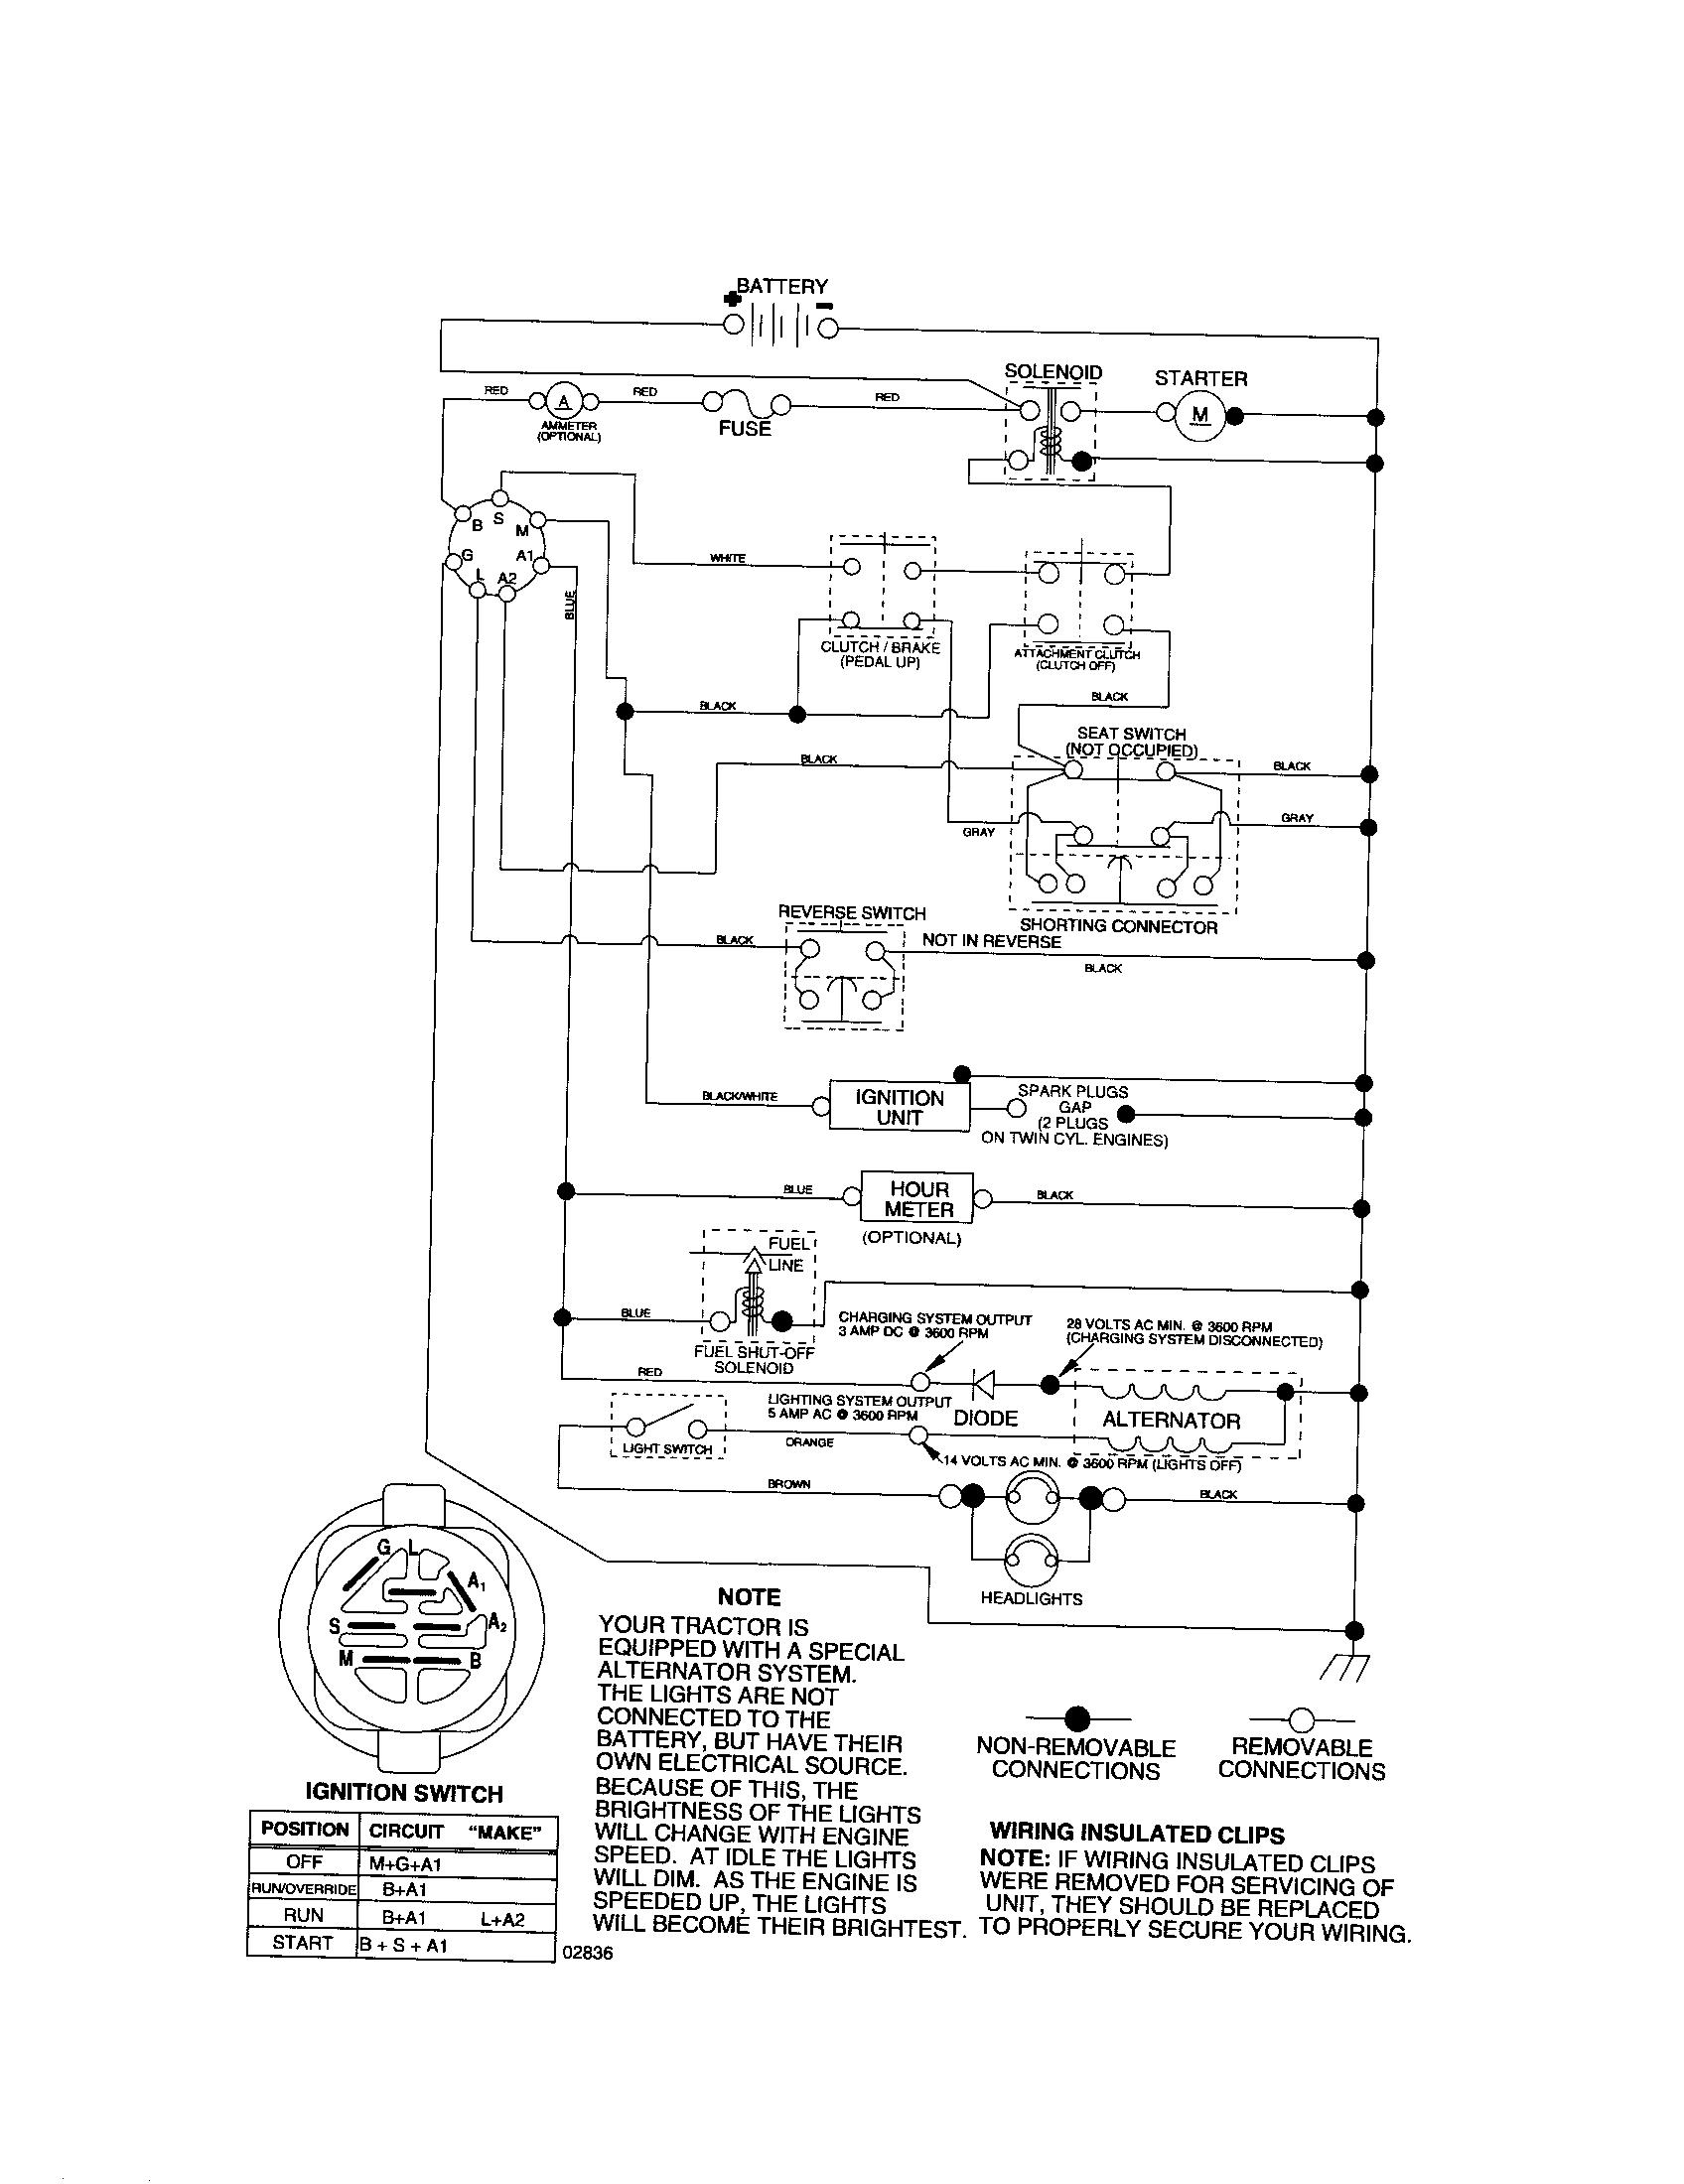 32 craftsman lt2000 wiring diagram